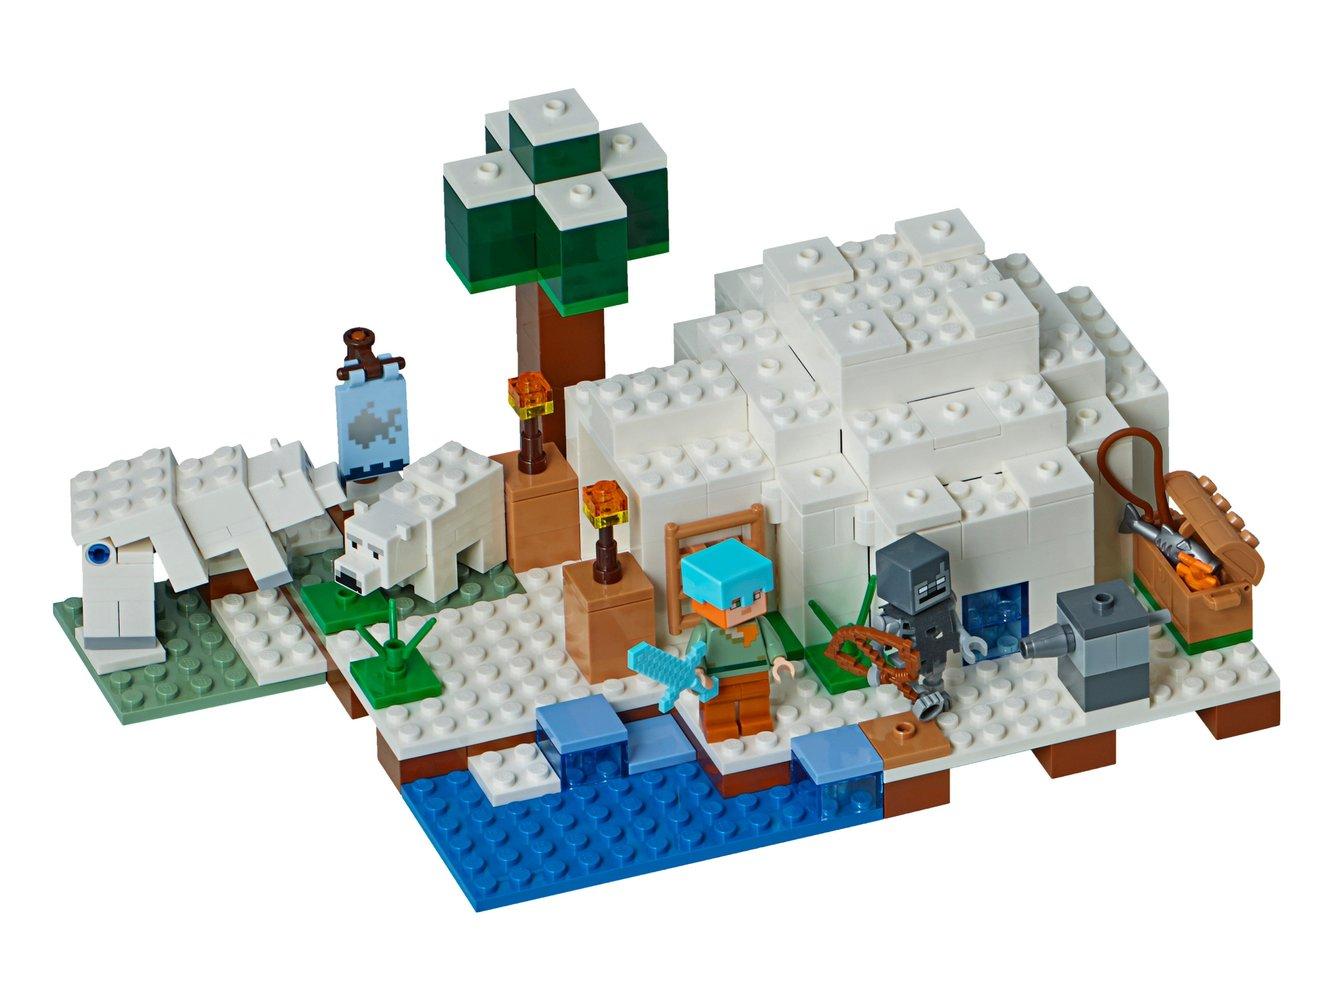 The Polar Igloo